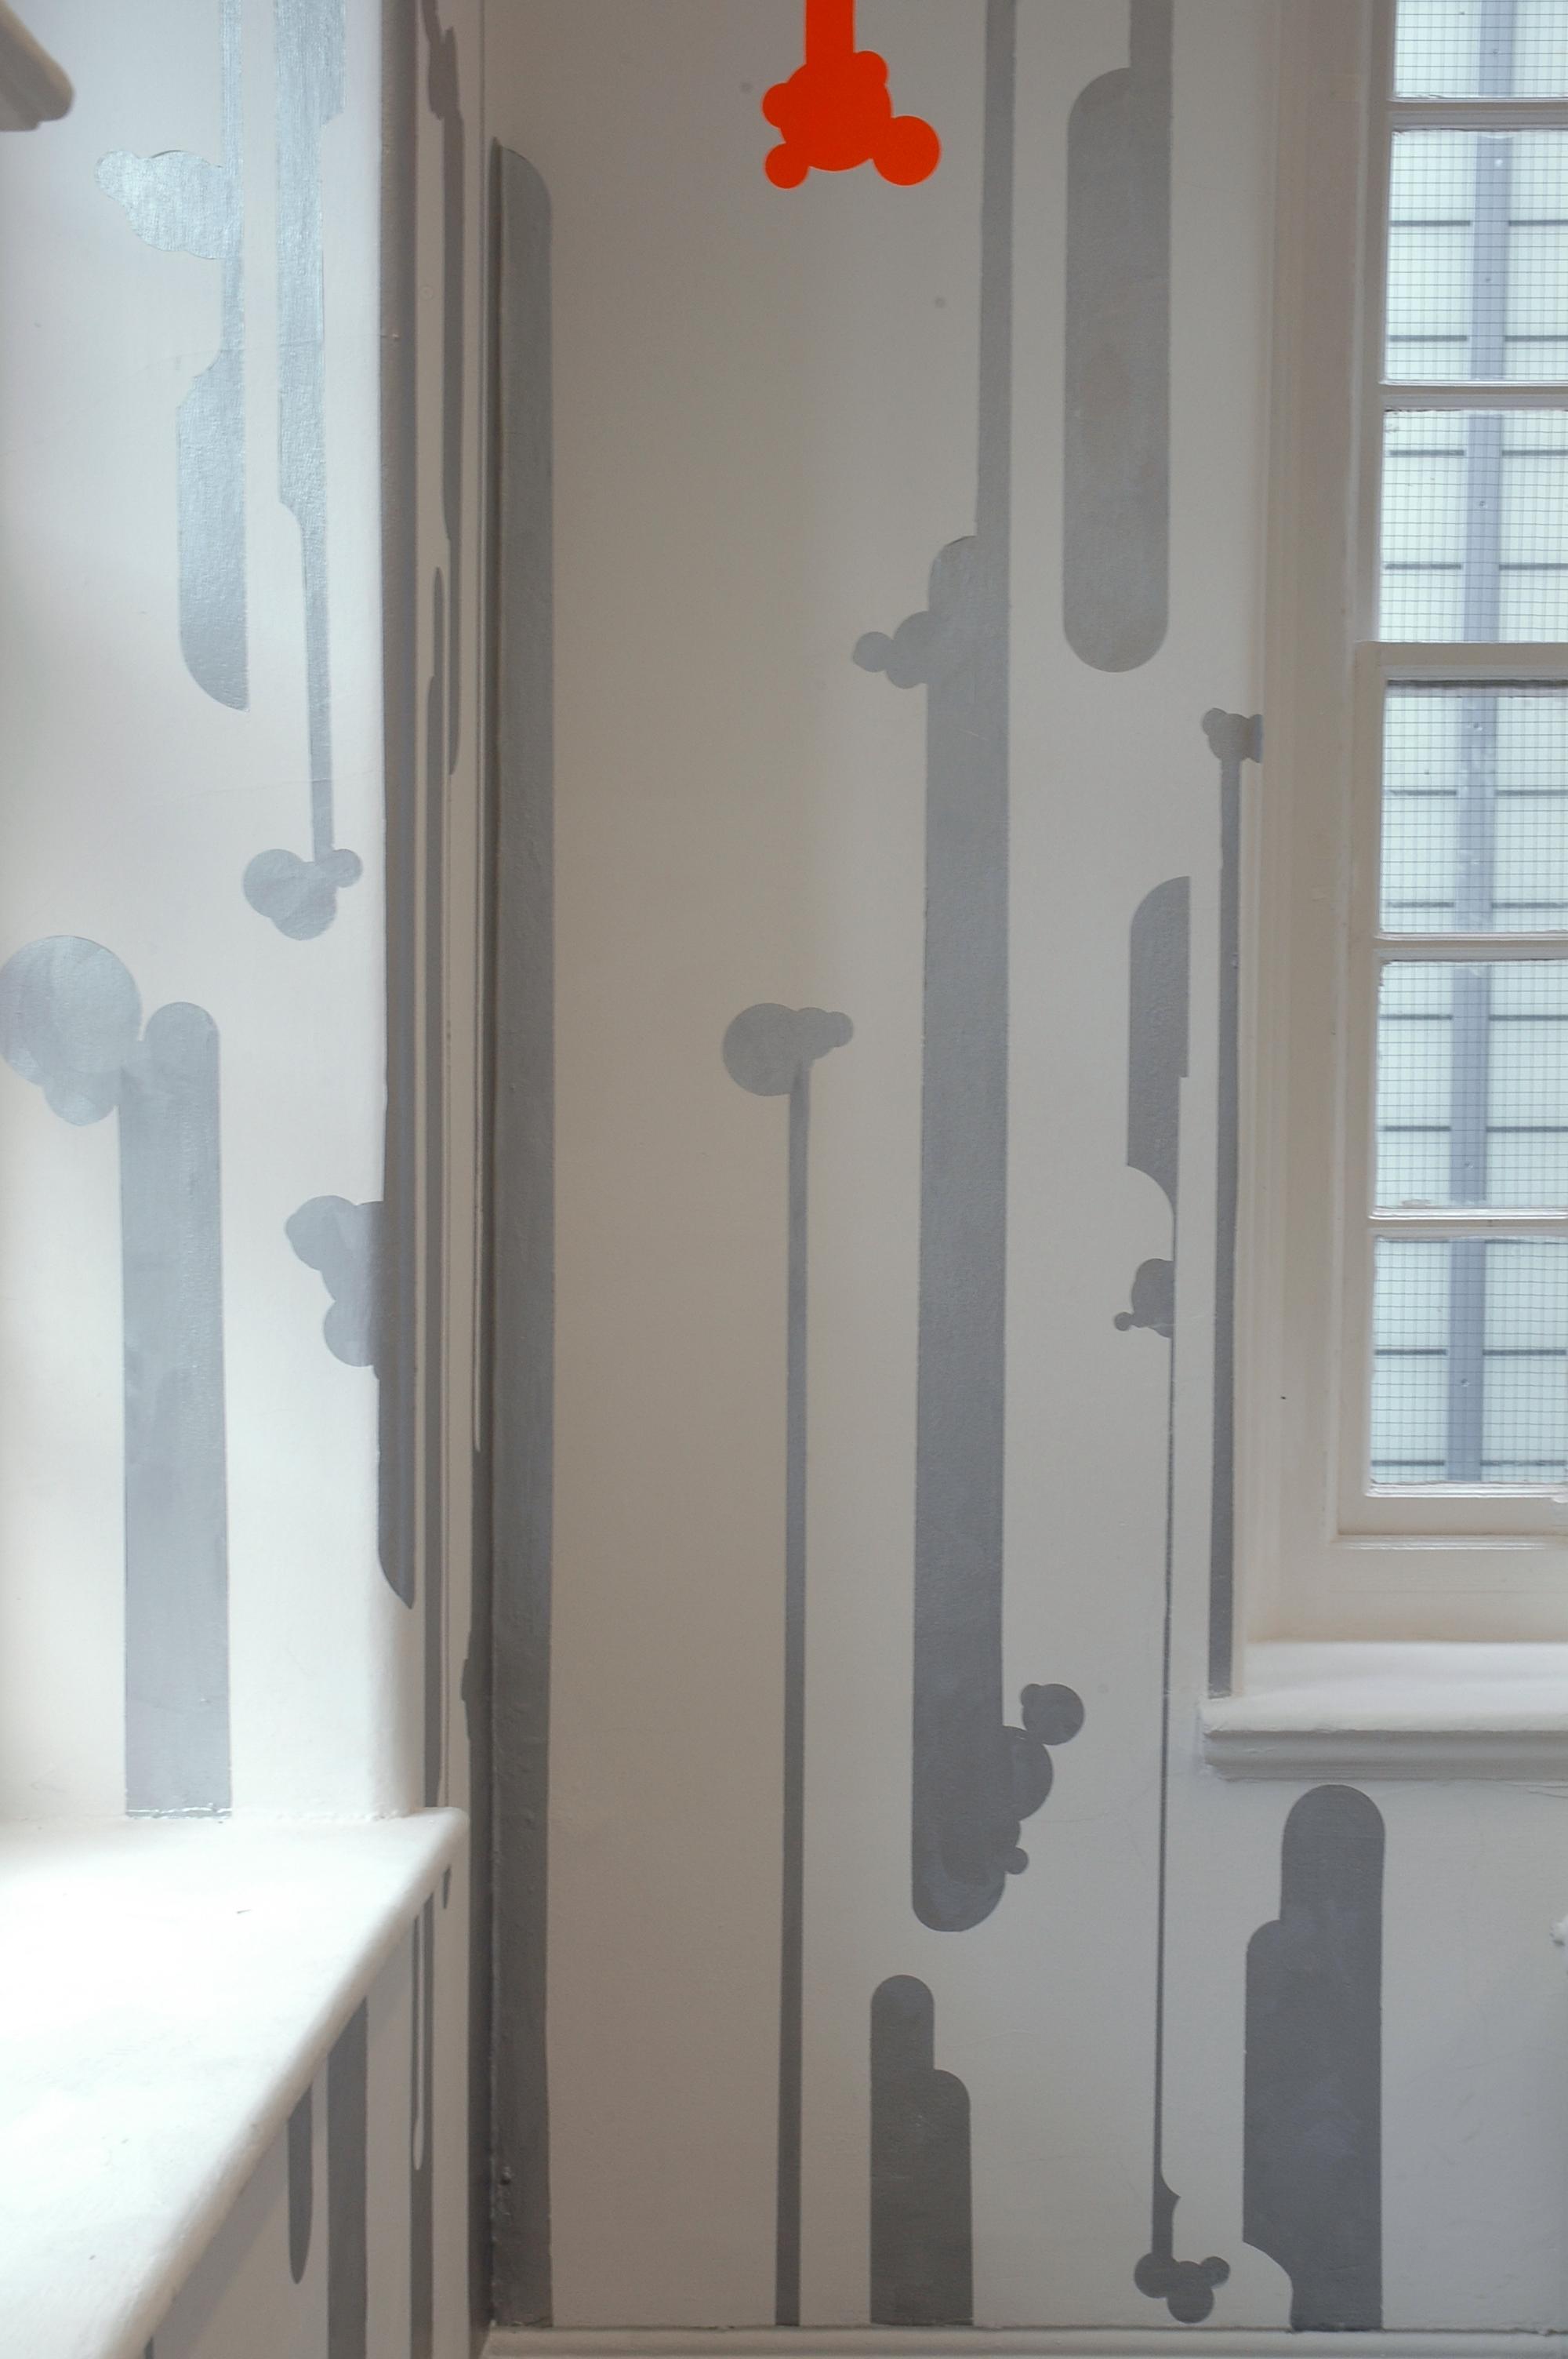 michael kutschbach, celia's spokes are sixty feet long, adhesive vinyl on wall 003.jpg